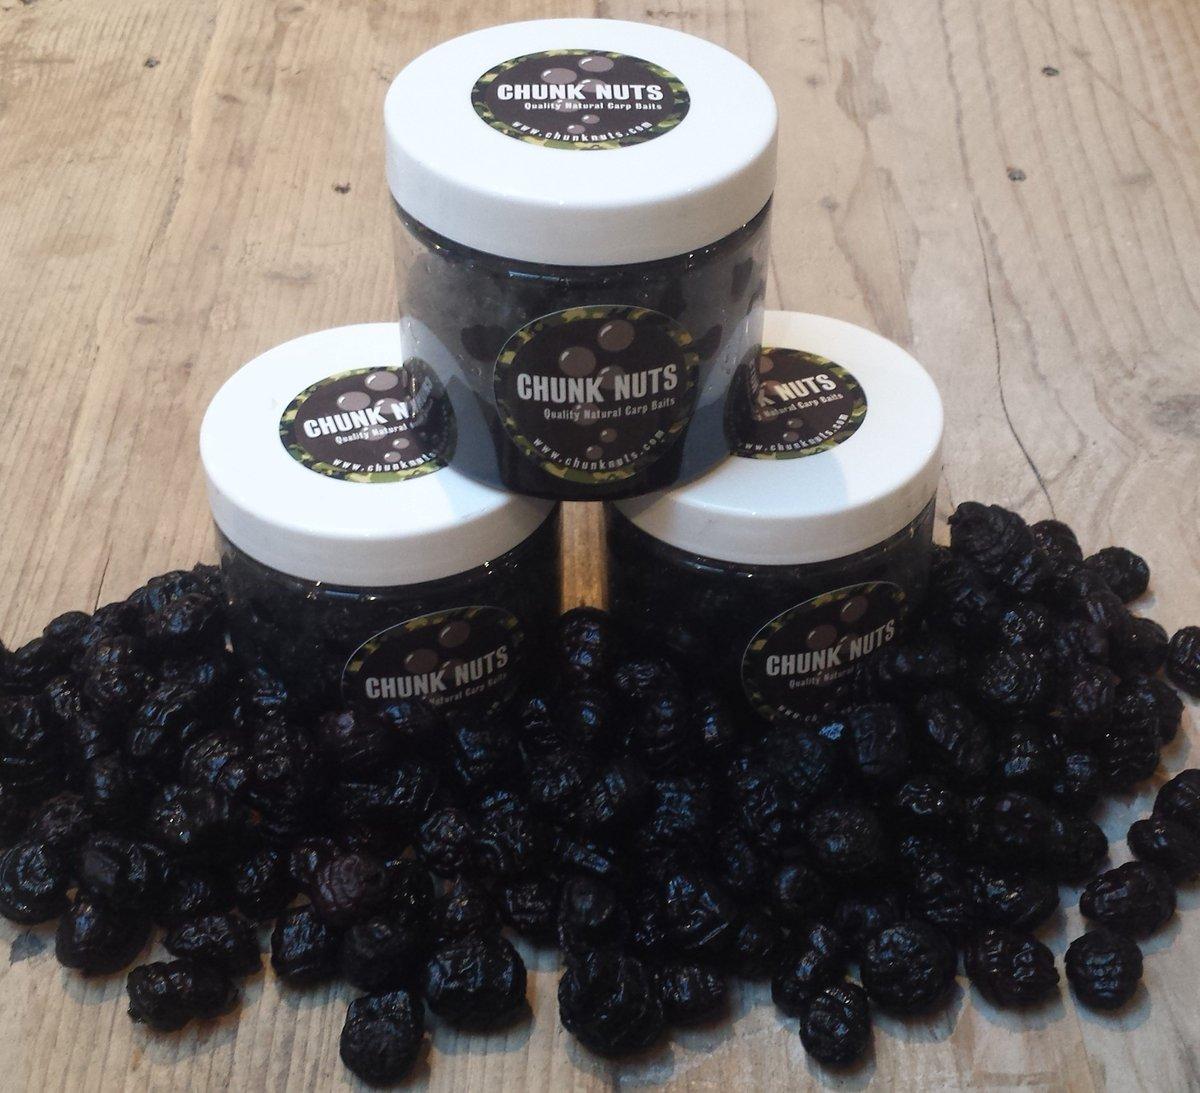 Image of Chunk Nuts 250ml Black Tiger Nut Hookbait pots